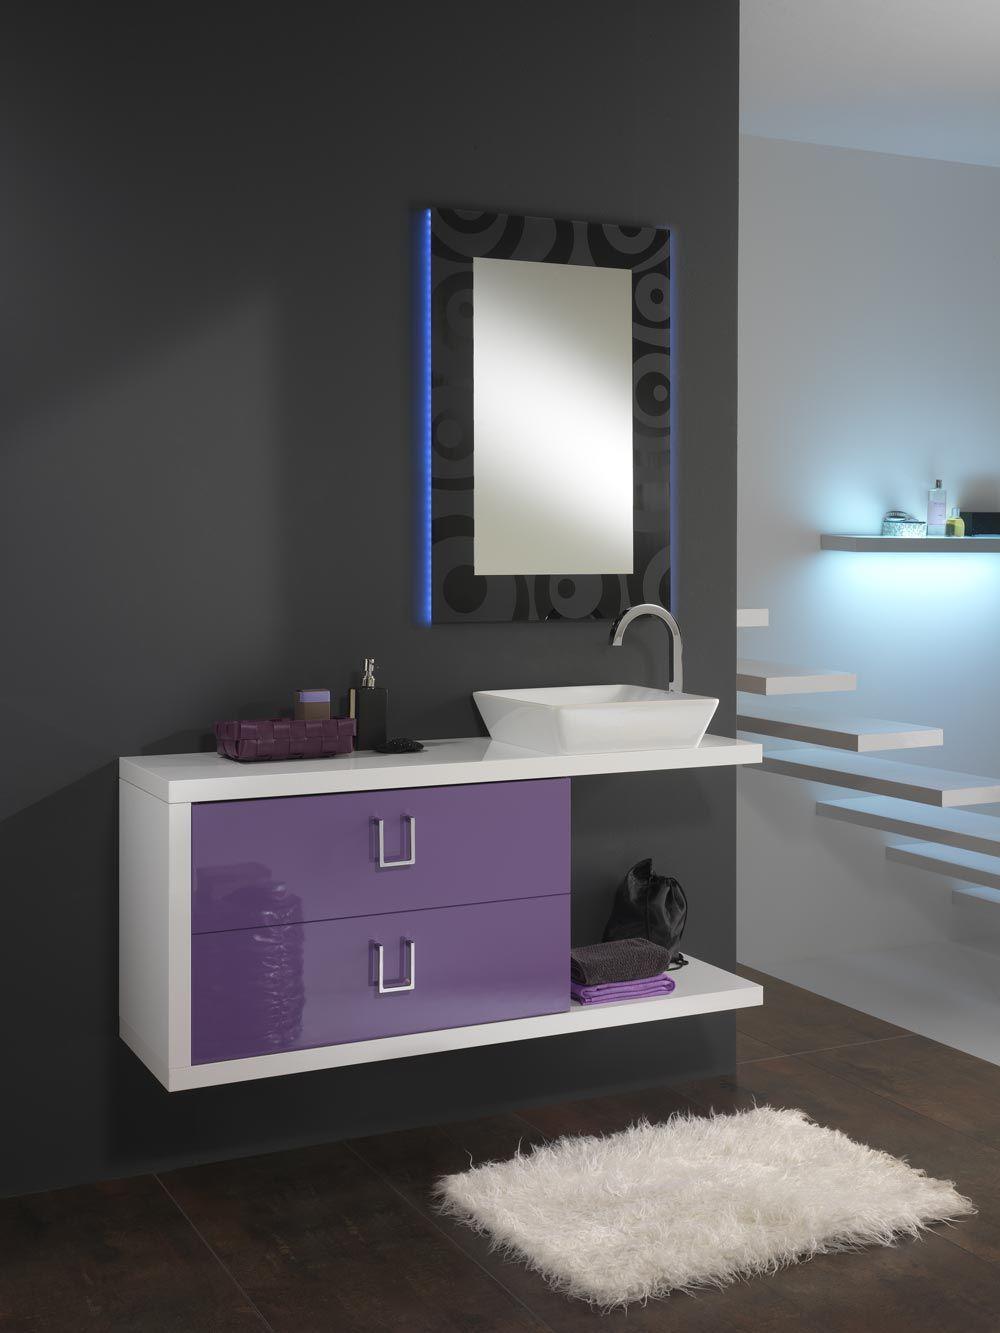 Tft Arredo Bagno.Tft Arredamento Made In Italy Arredamento Casa Silvia E